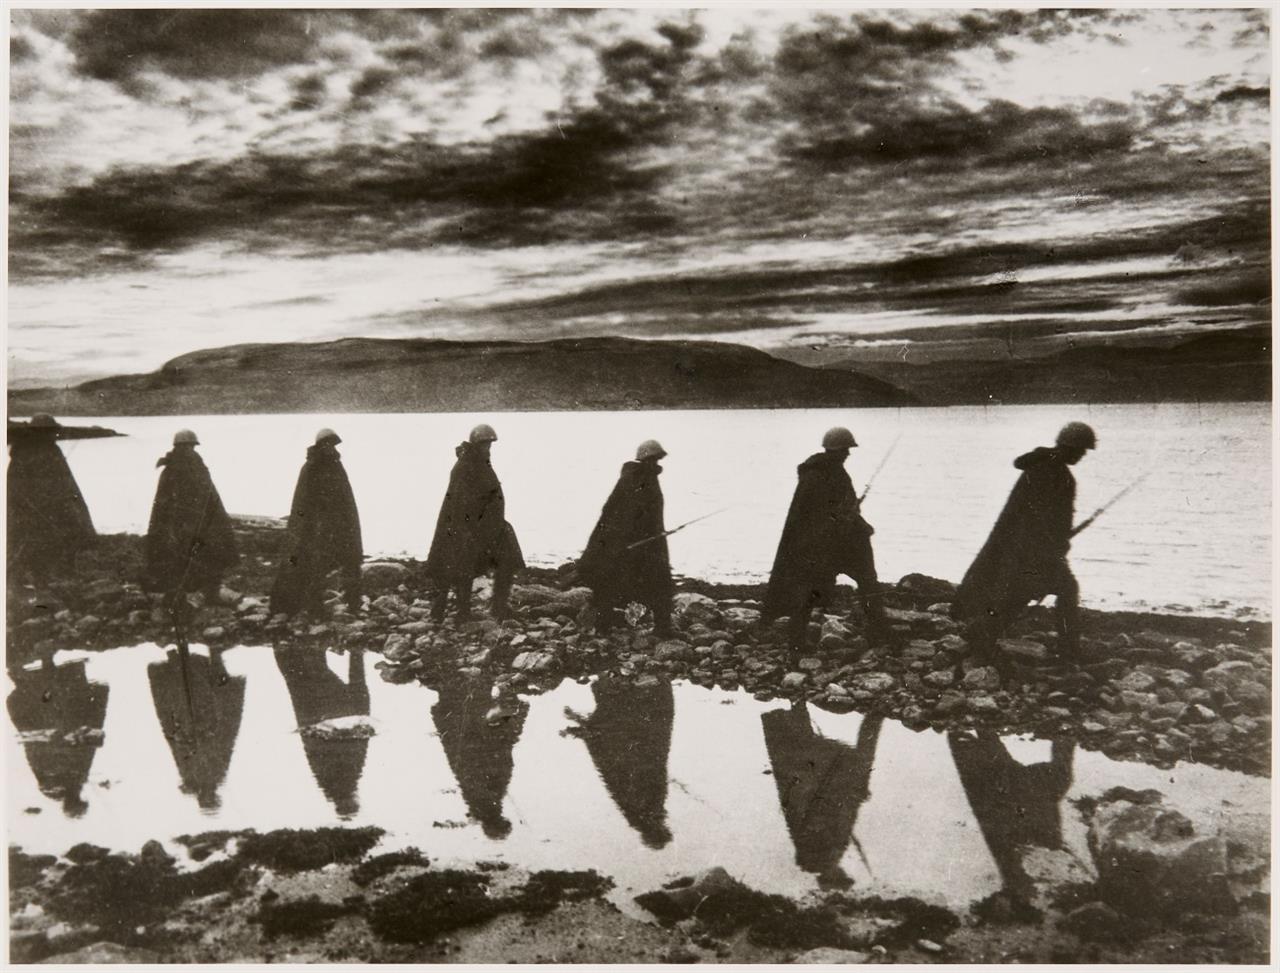 Yevgeni Chaldej. Murmansk. (1942). Silbergelatineabzug. Signiert. Wohl späterer Abzug.